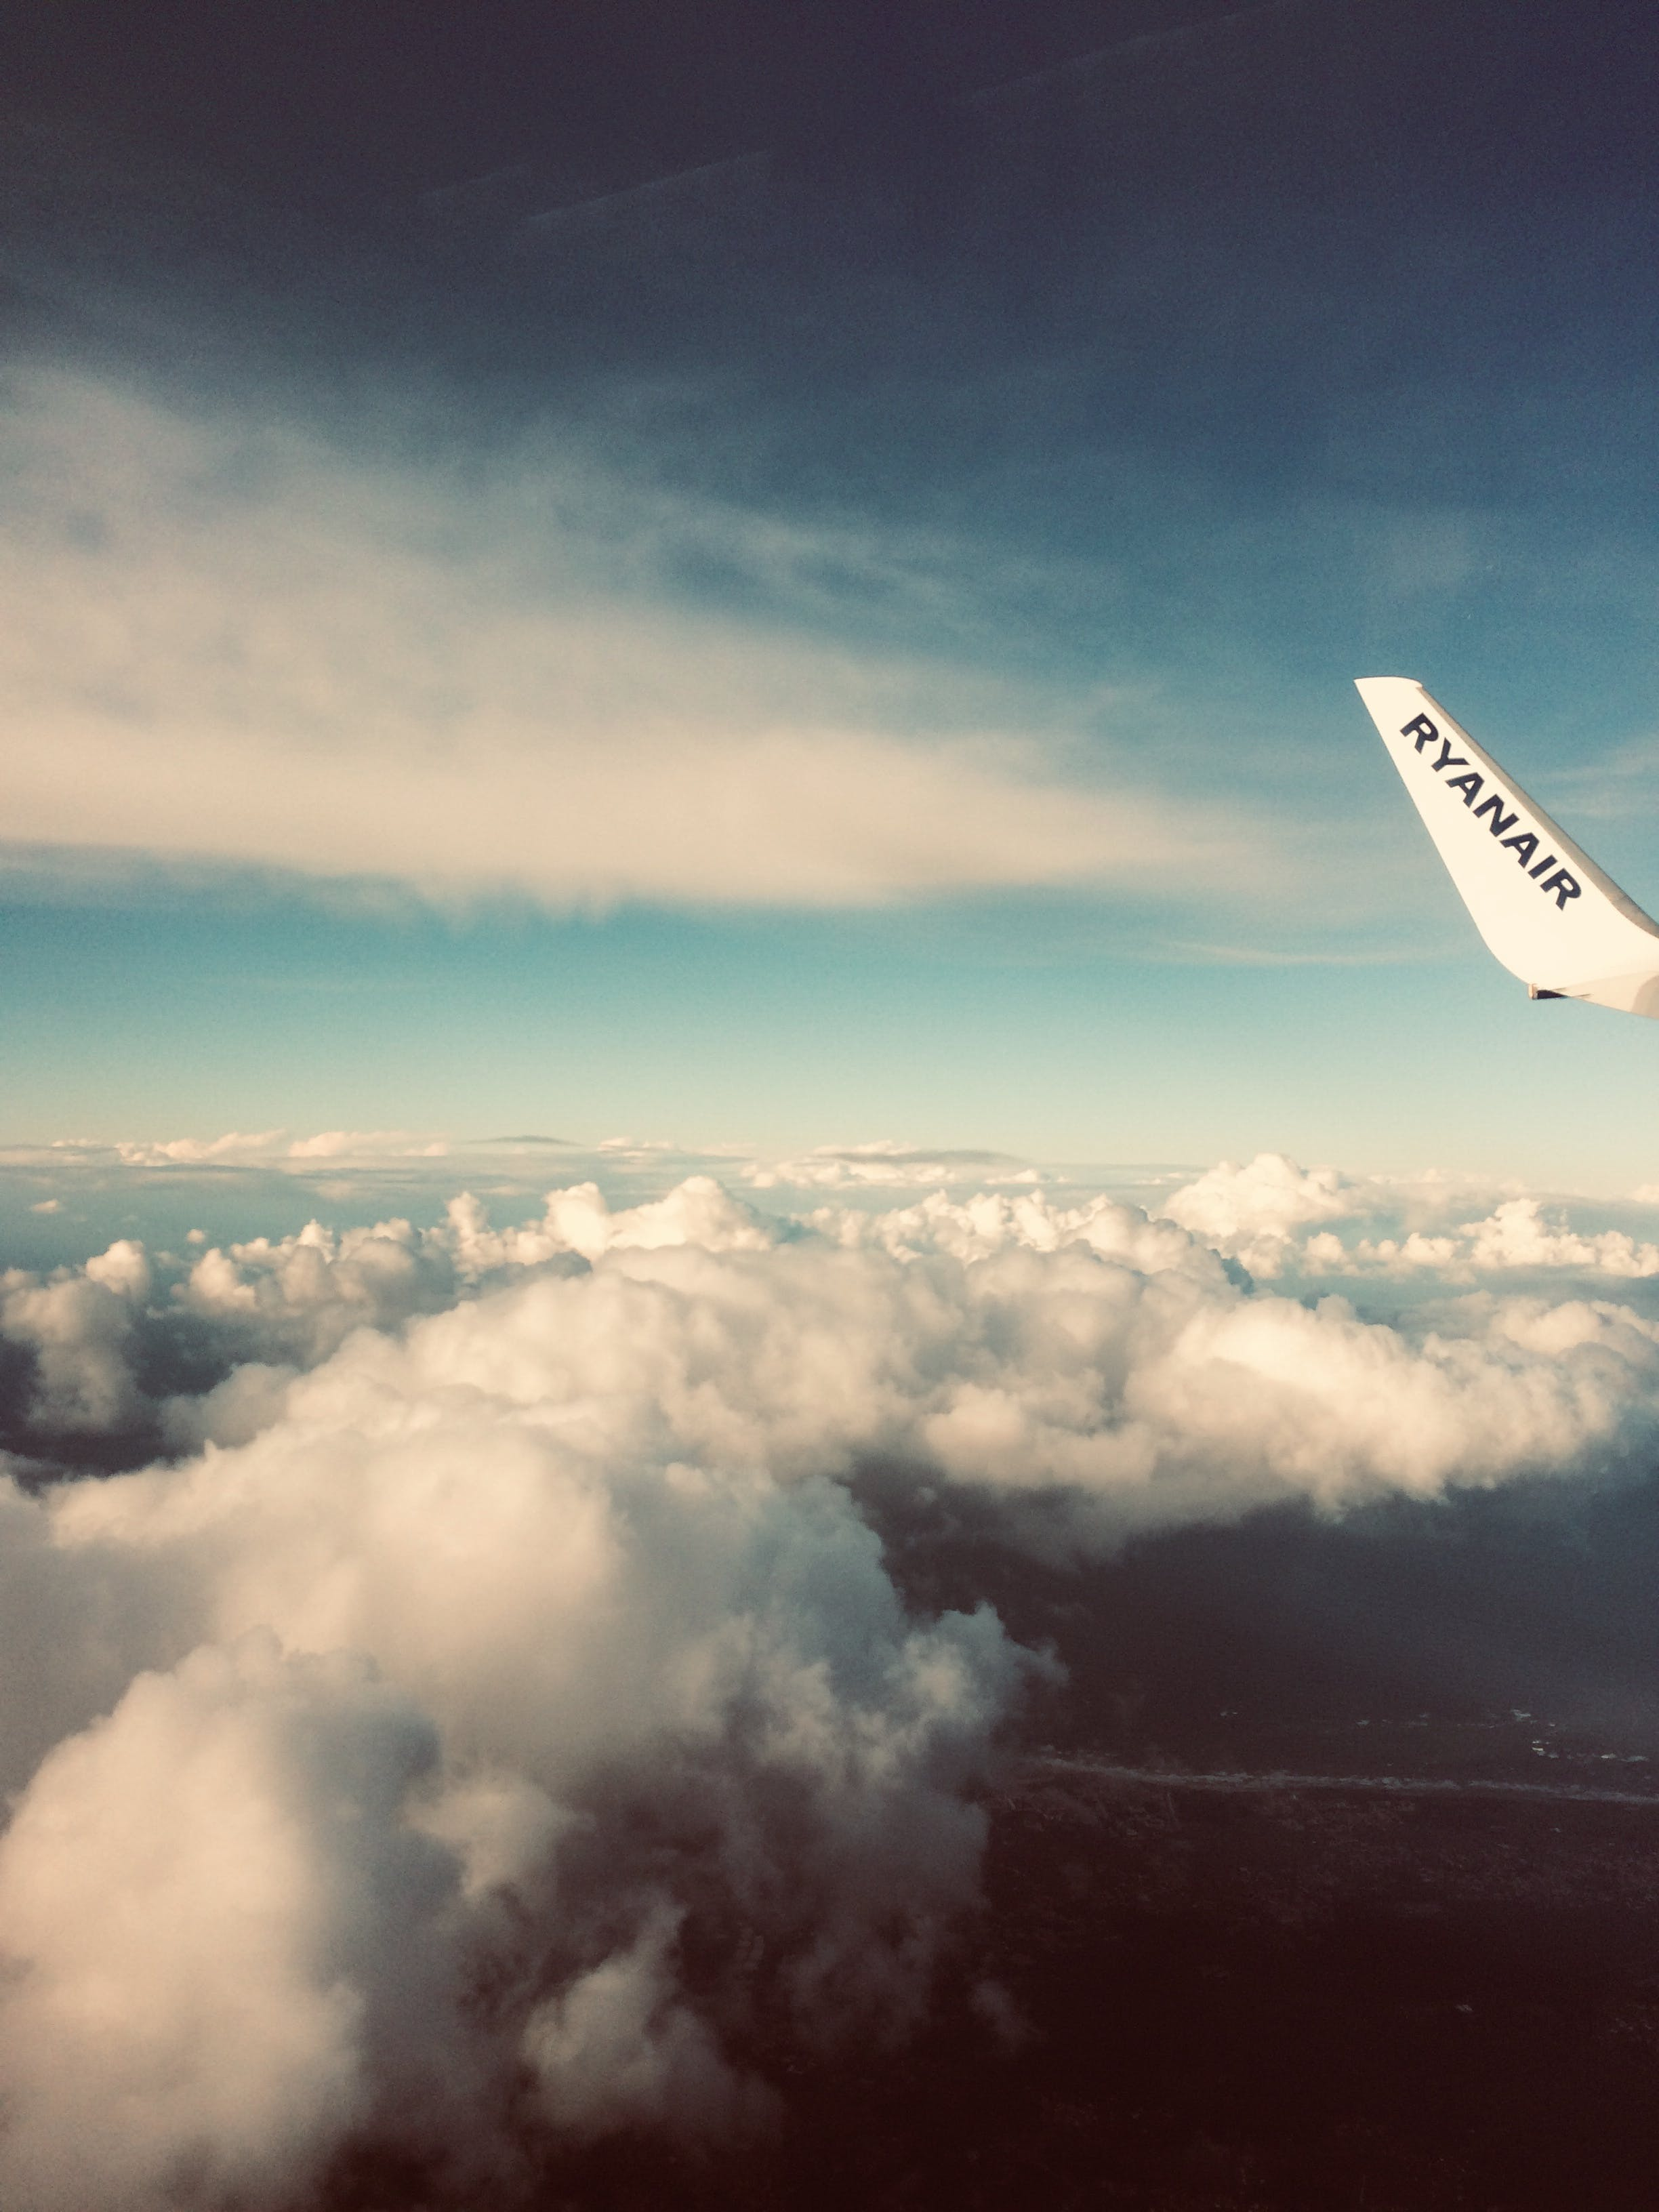 Plane's Tail Near Clouds